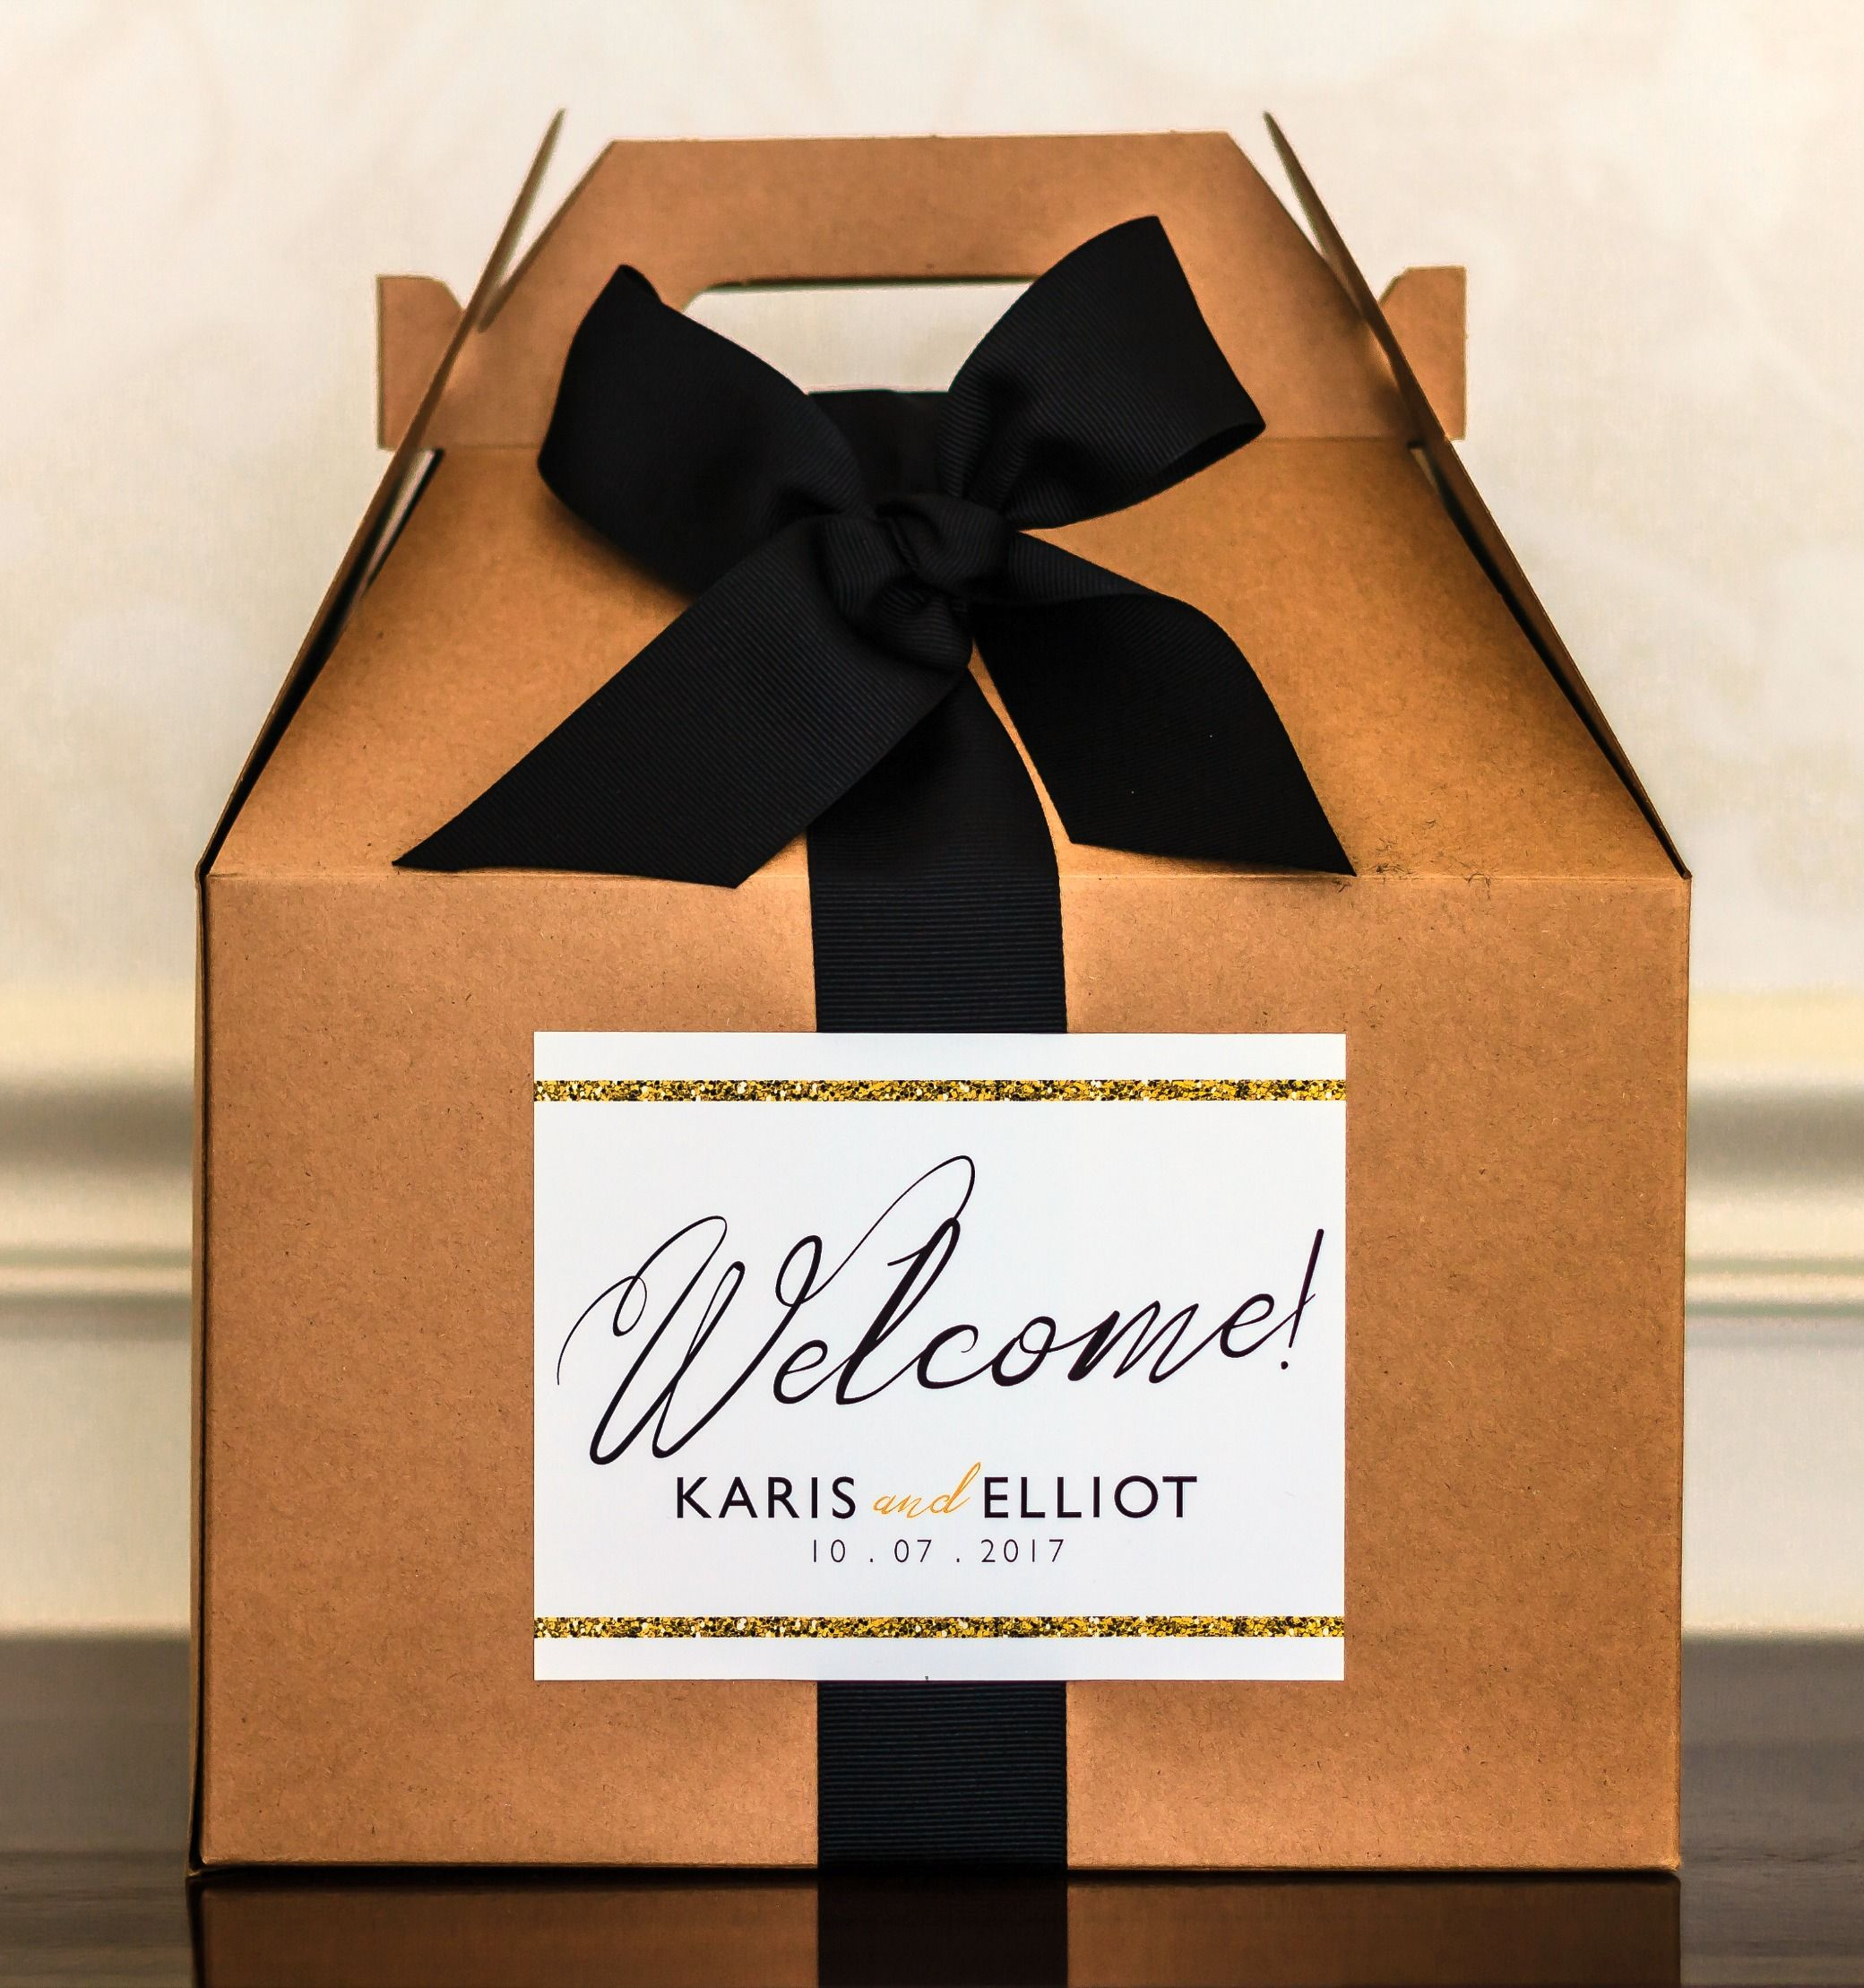 Wedding Welcome Bag Letter Template - Script Wedding Wel E Bag Stickers Gold Wel E Bag Labels